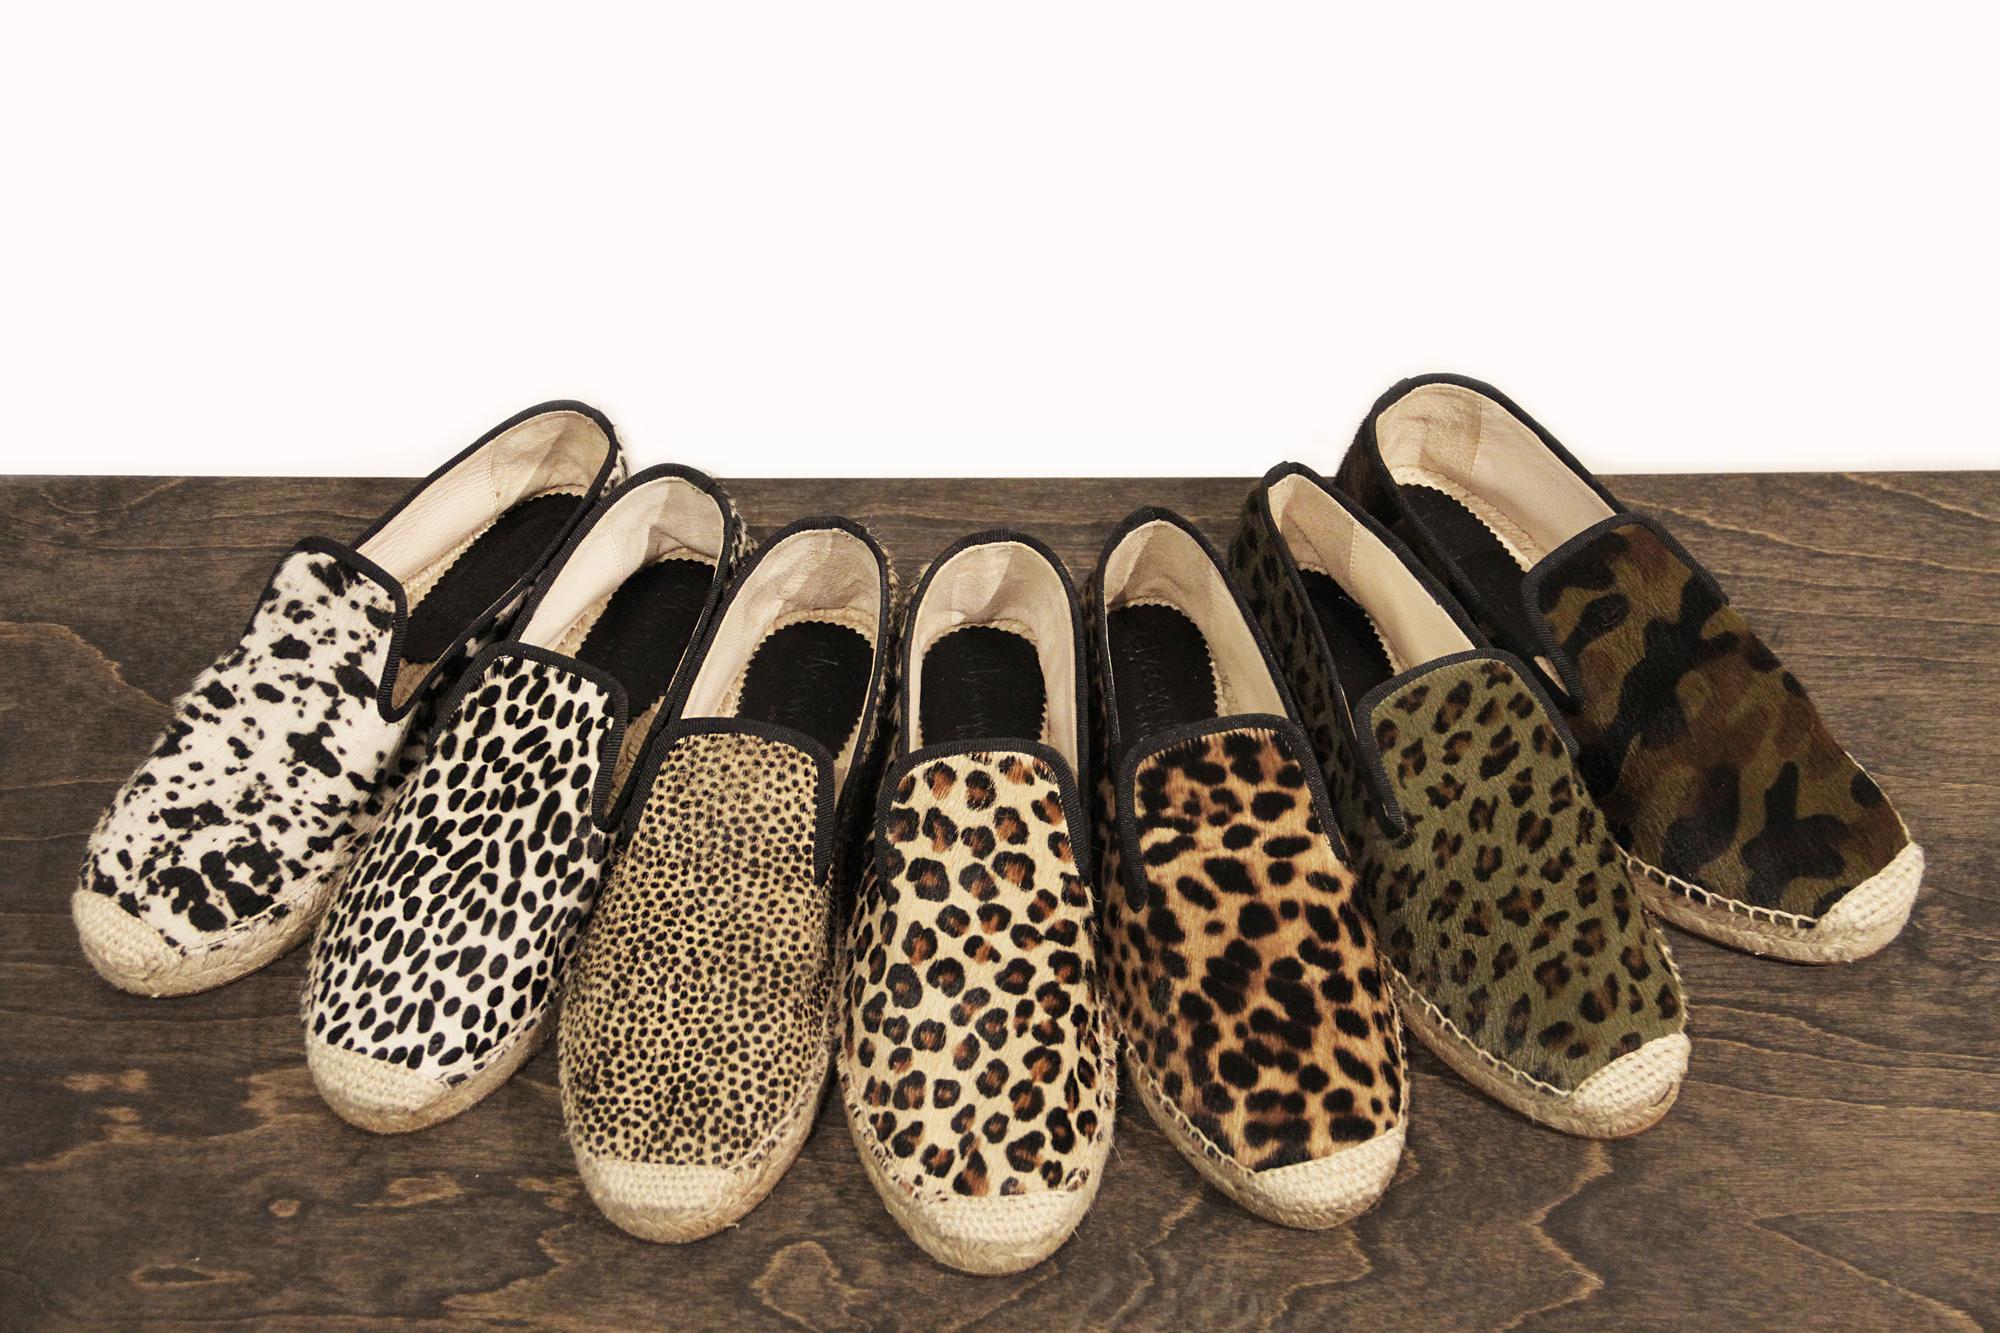 elyse walker flat espadrilles spain animal print | treschicnow.com #spring #shoes